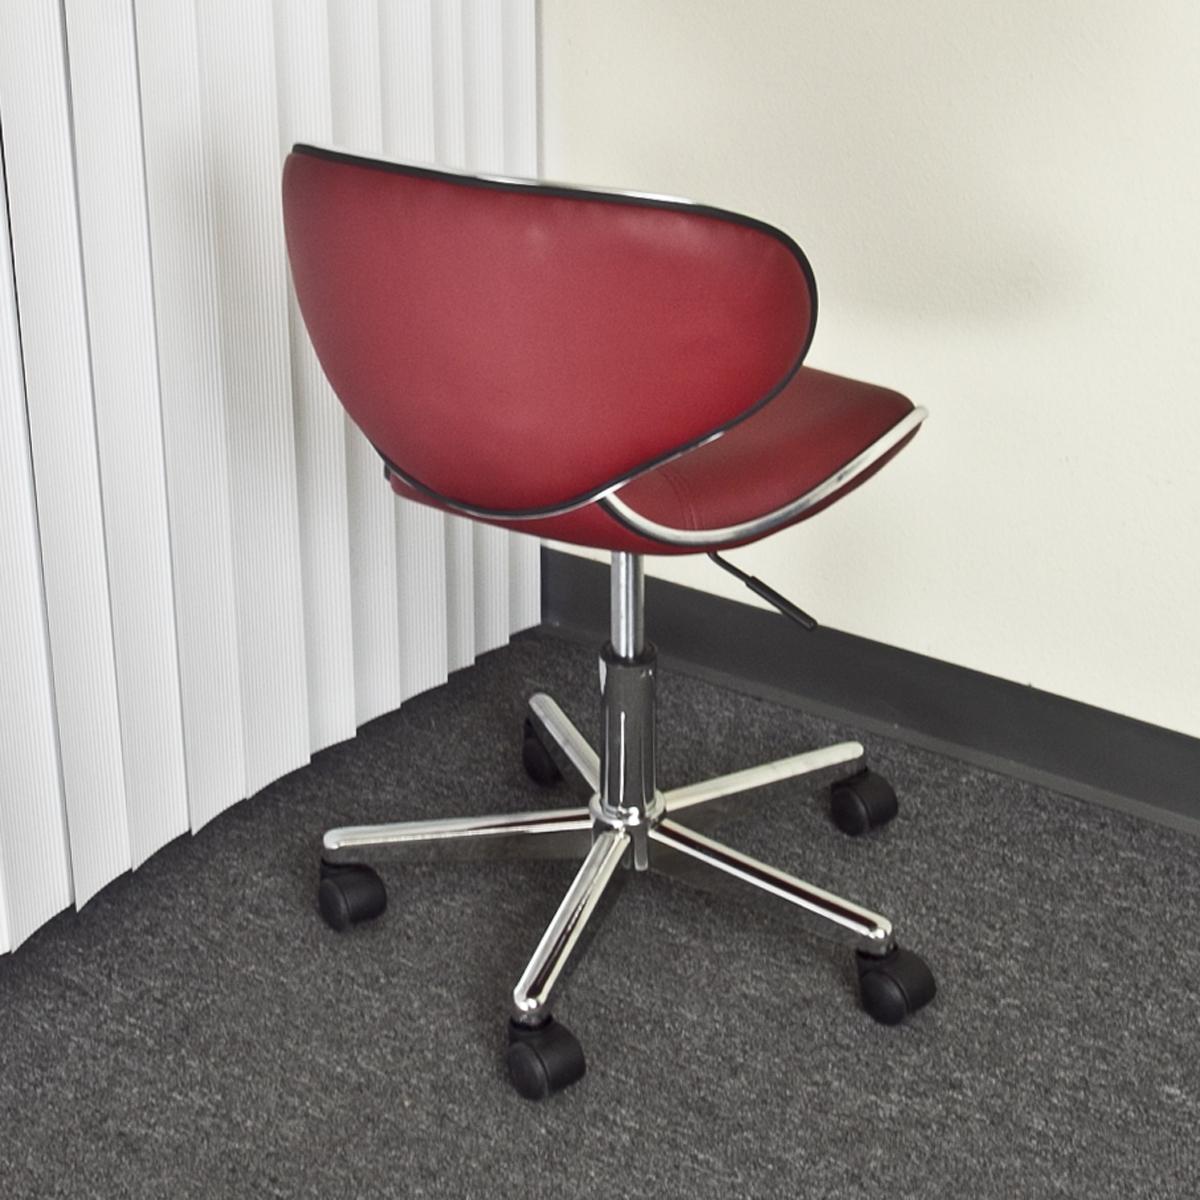 new leather hydraulic salon chair stool spa beauty burgundy red tattoo